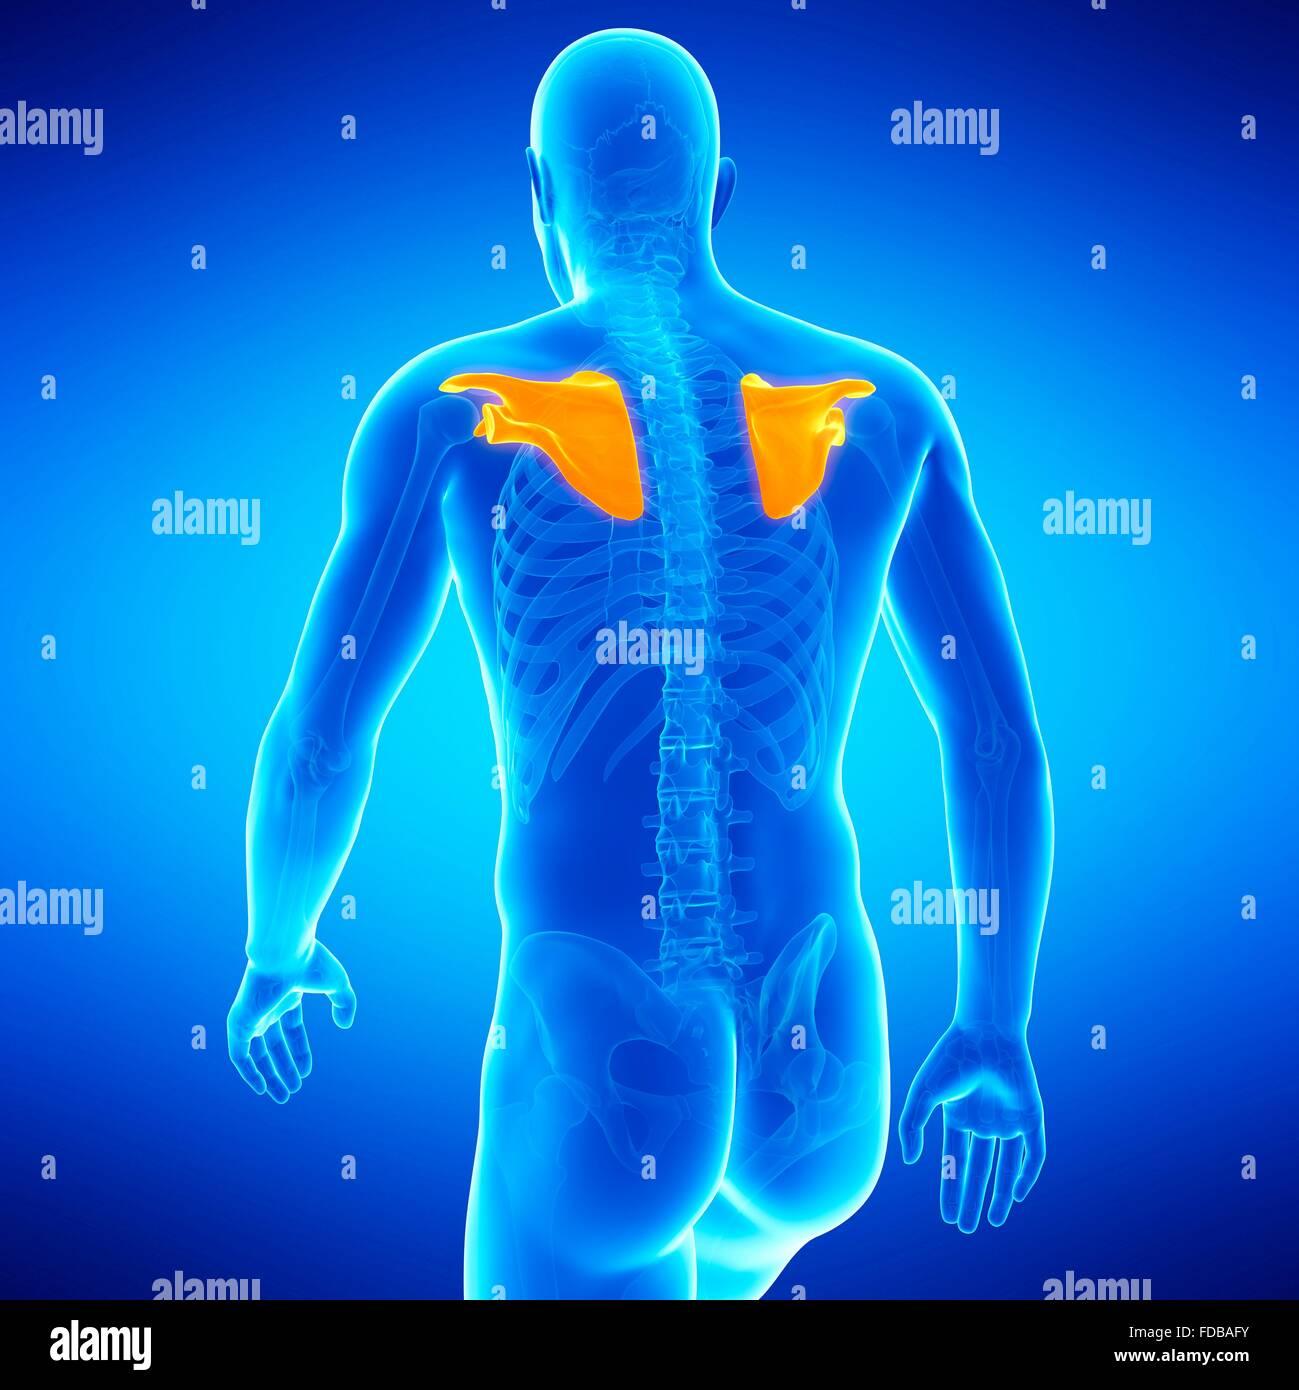 Human shoulder blades, illustration Stock Photo: 94292127 - Alamy